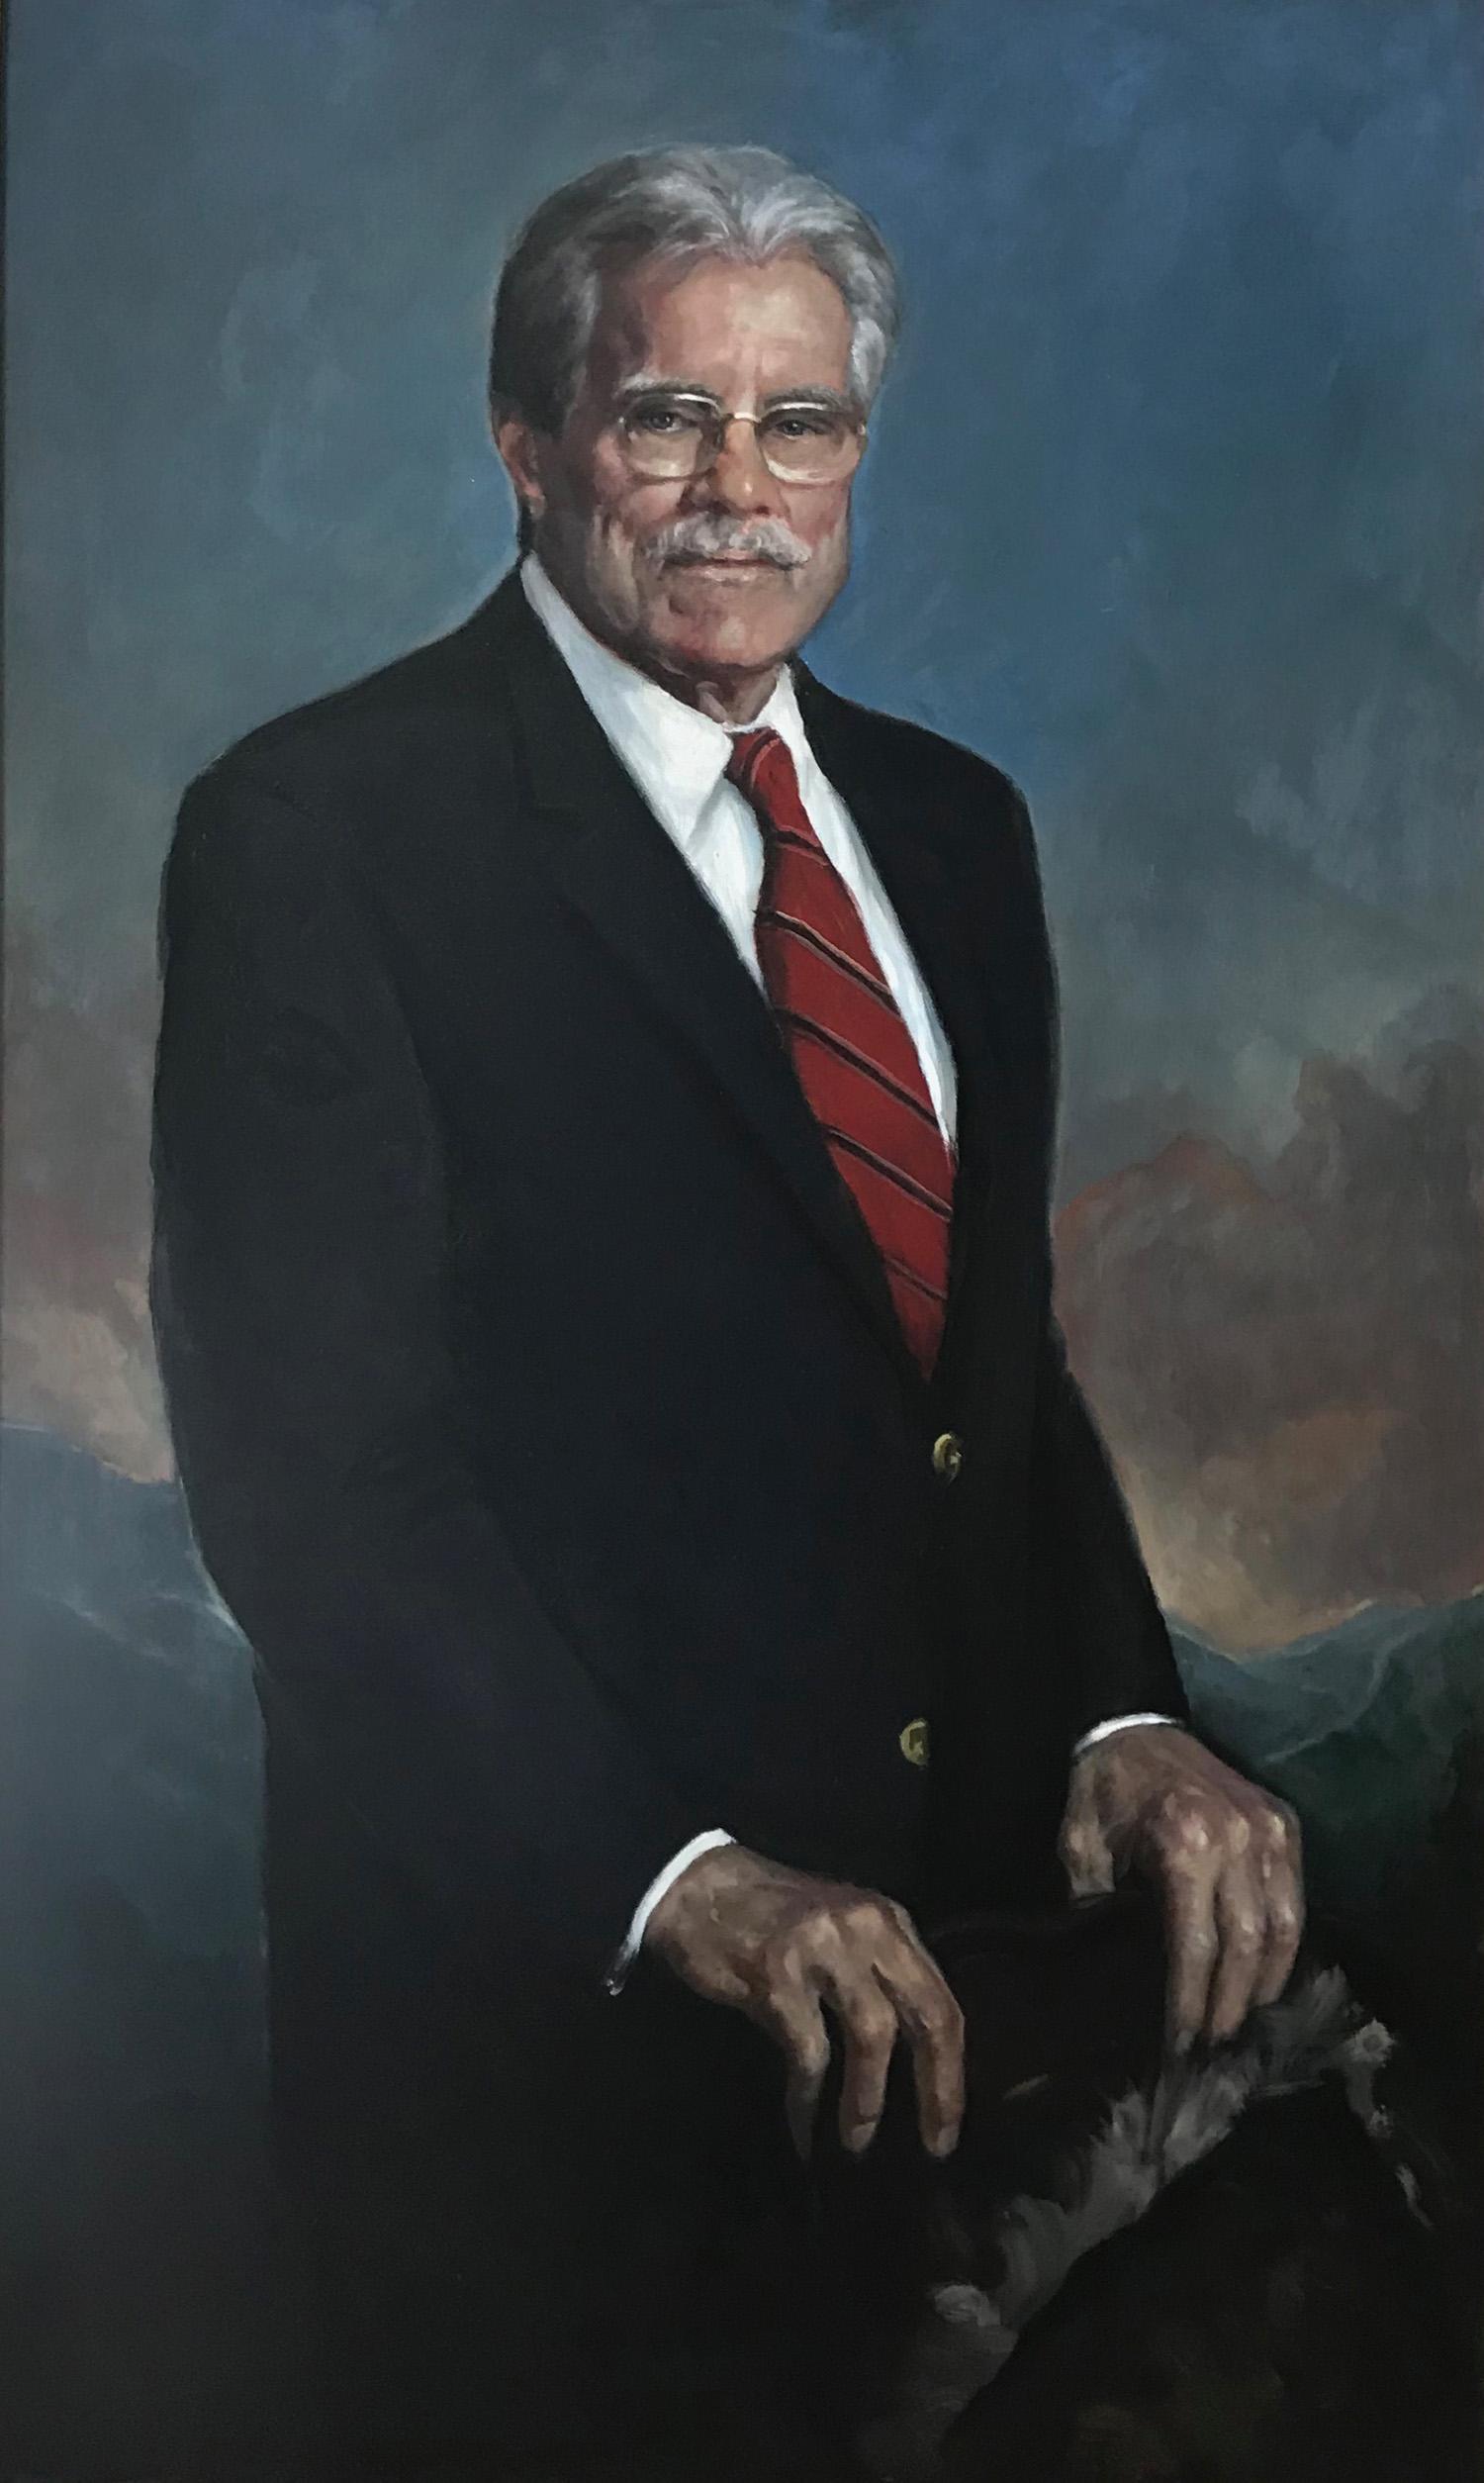 "Senator Mark McDonald, Majority Whip, Vermont Senate, 30"" x 50"", NFS"